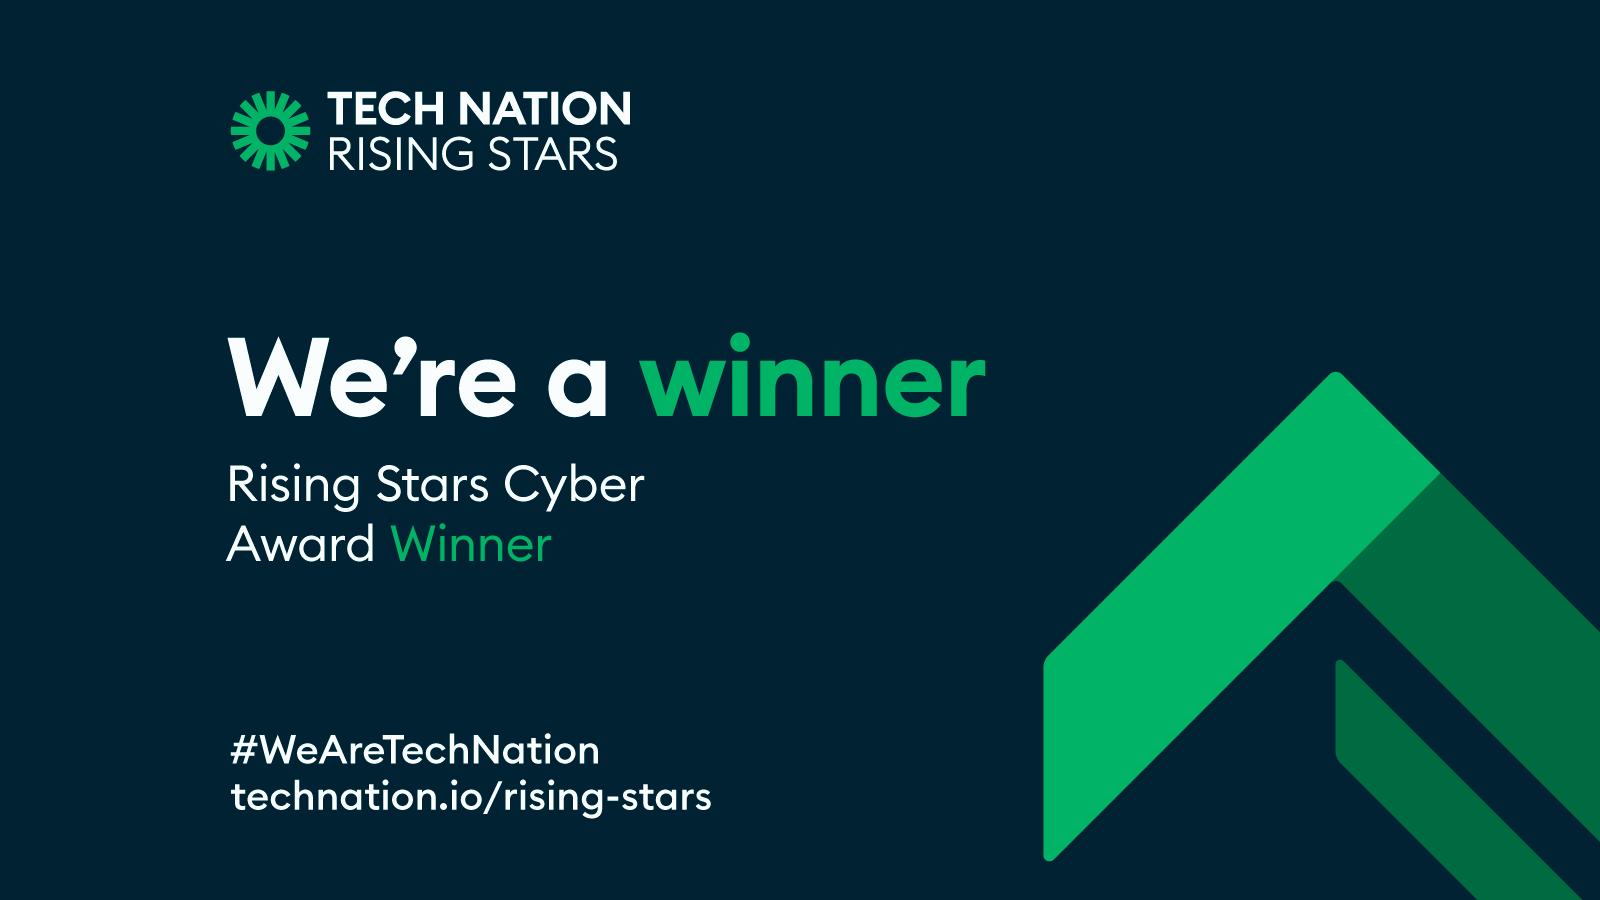 Beacon wins Tech Nation Rising Stars 3.0 Cyber Award